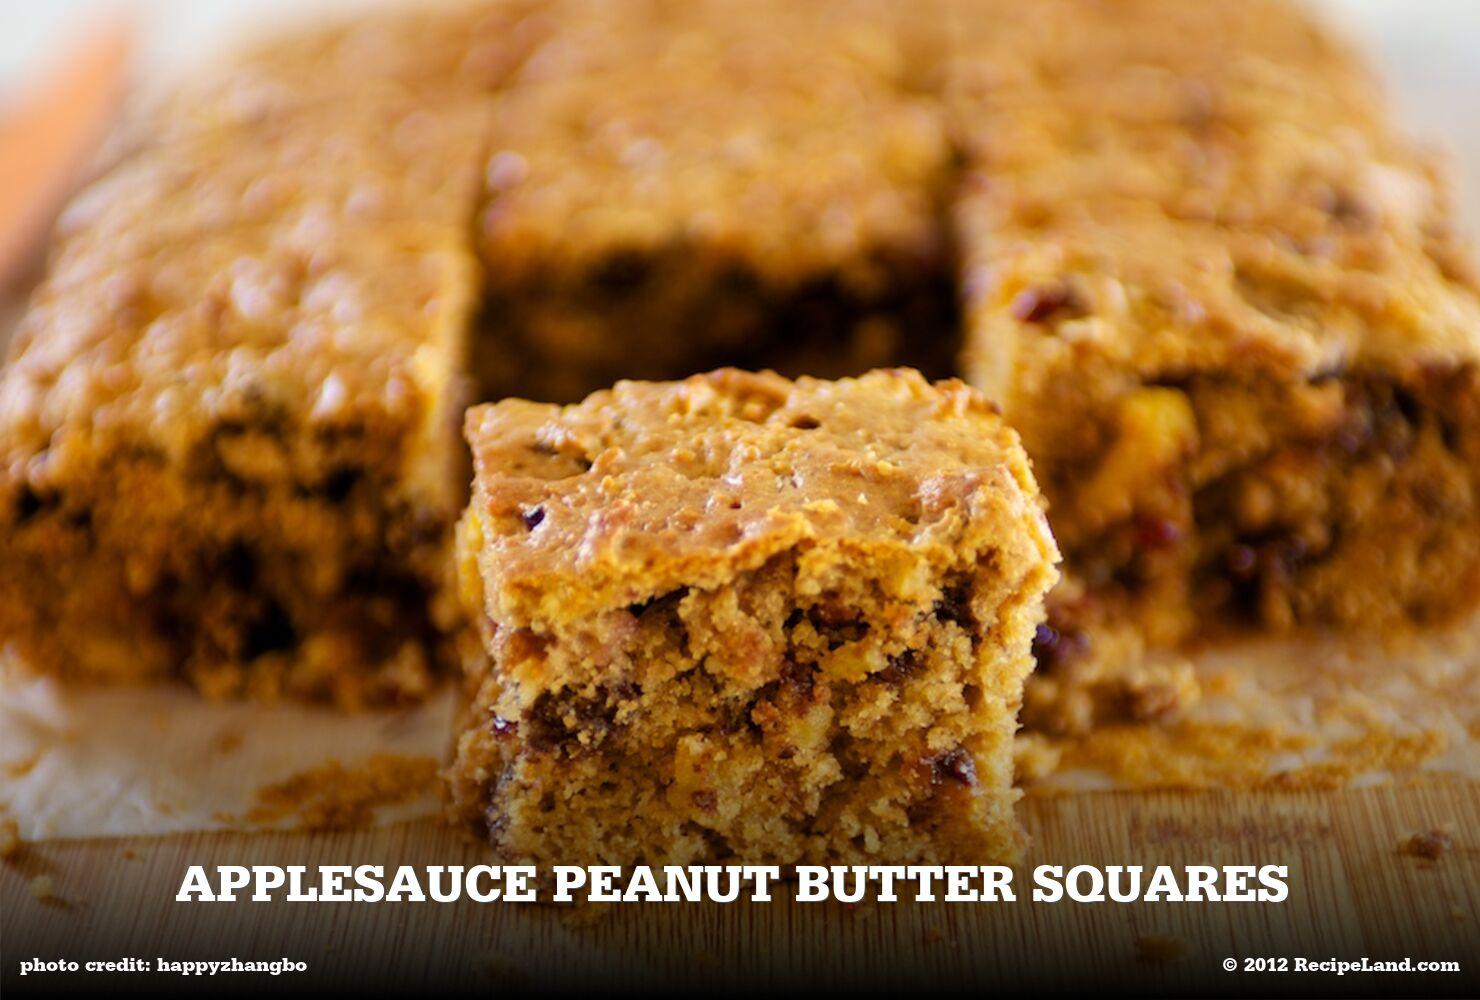 Applesauce Peanut Butter Squares